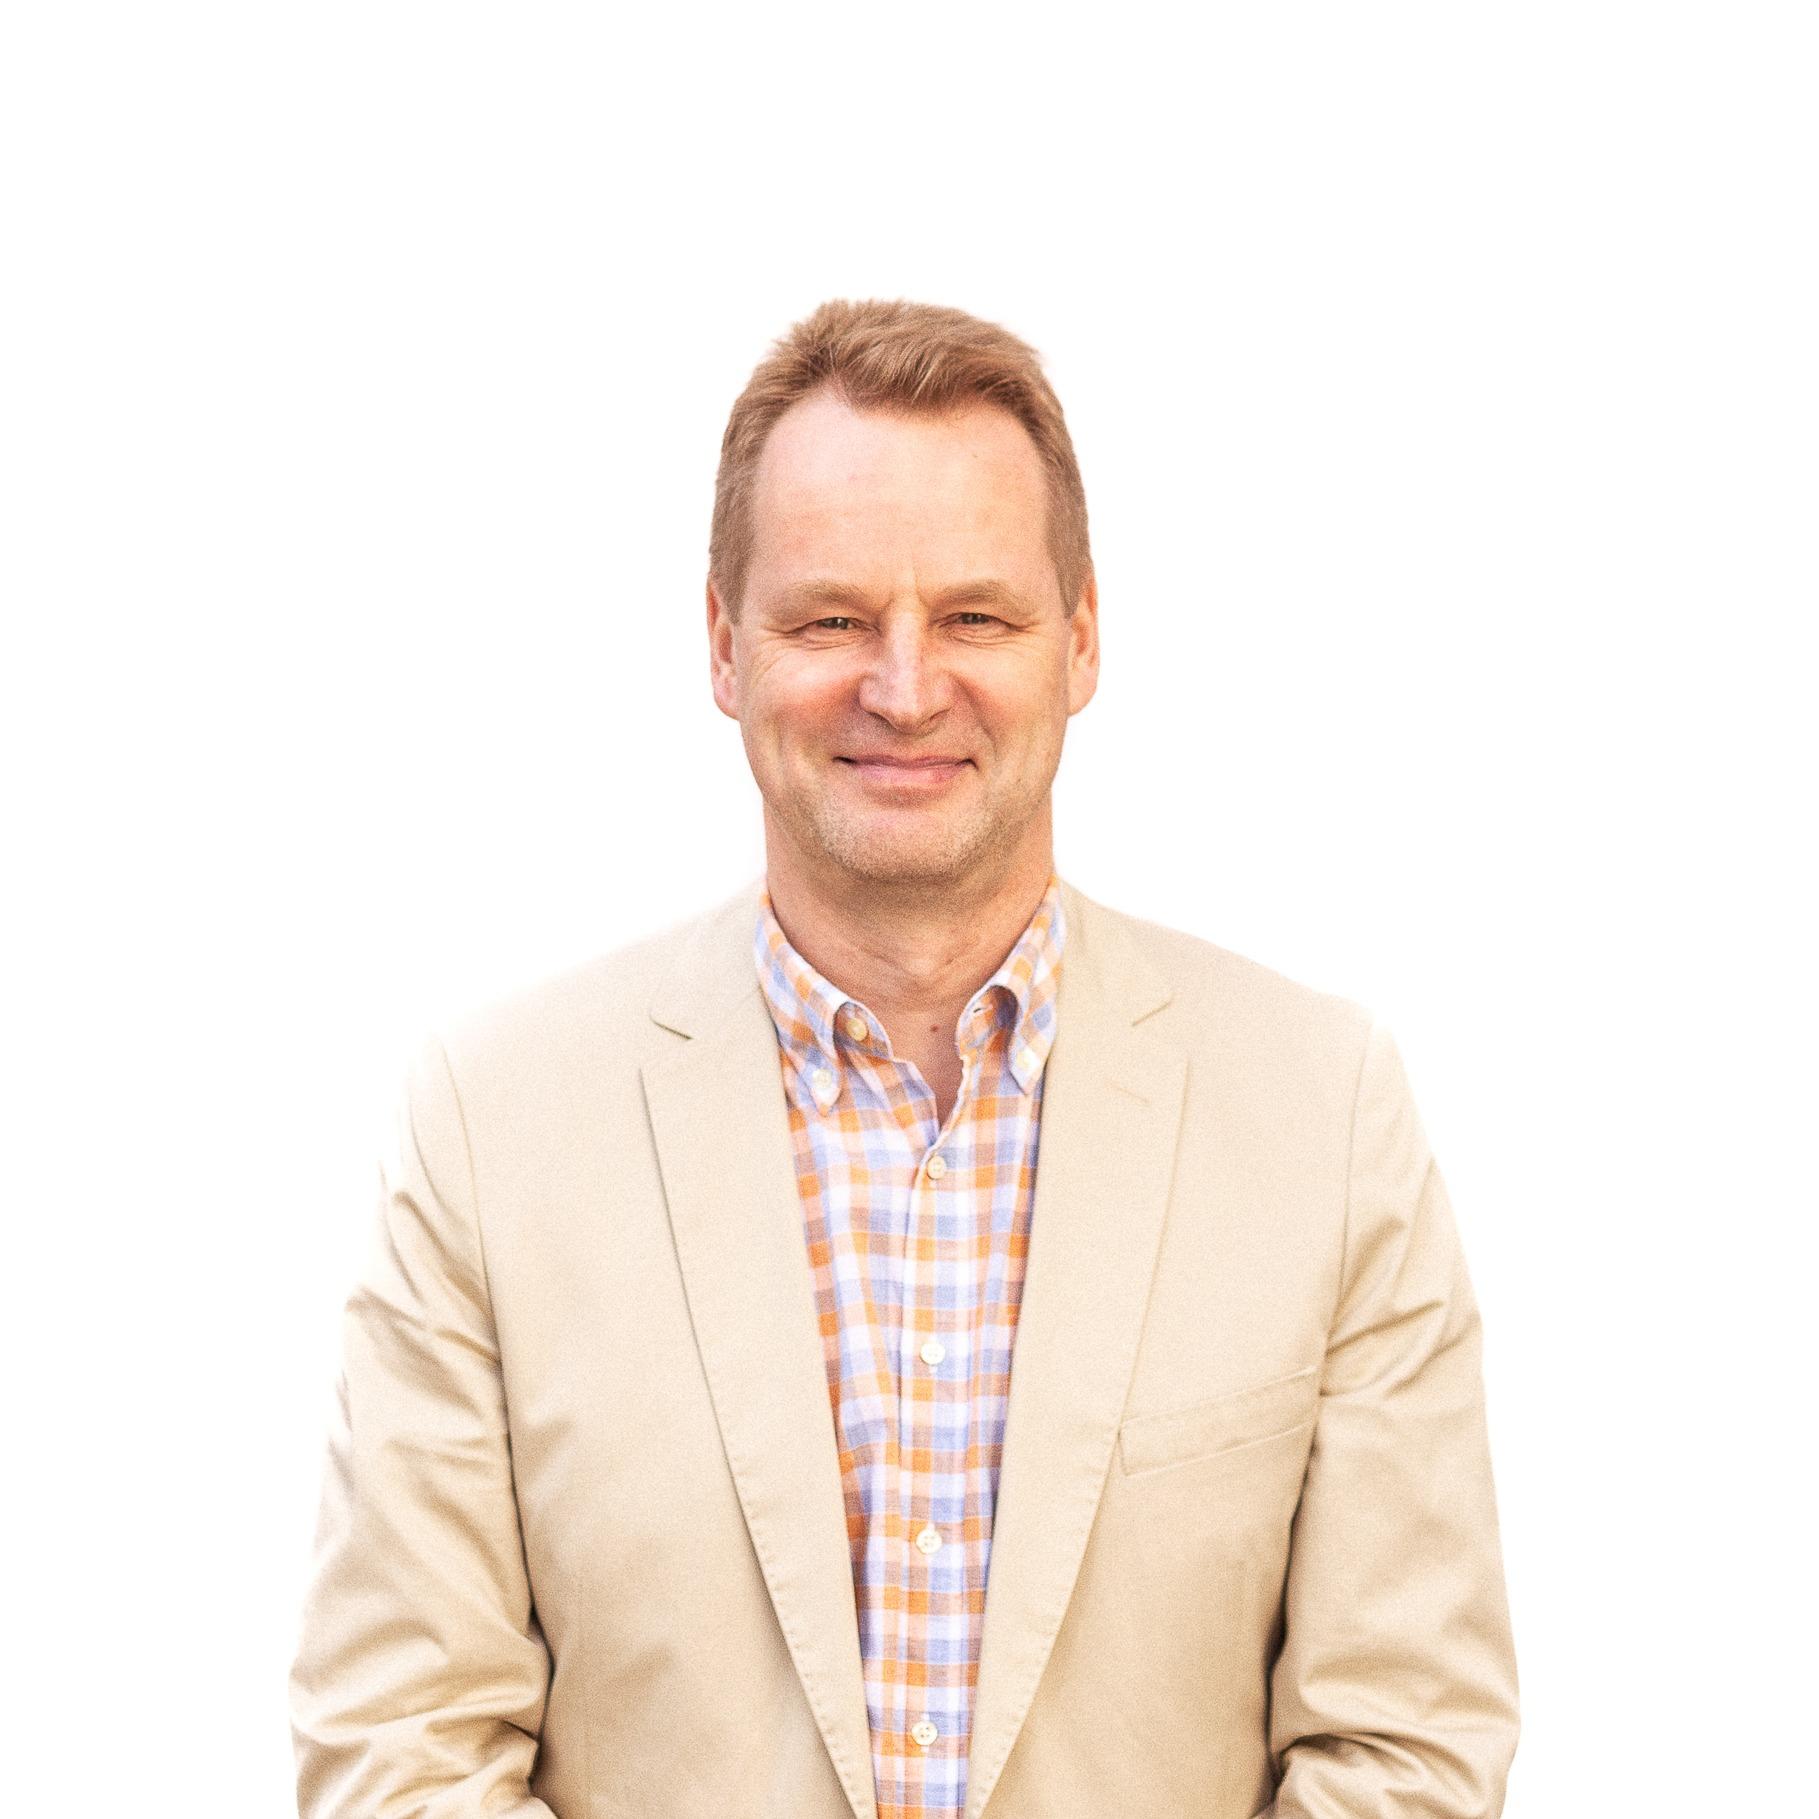 Jyri-Jukka Ääri